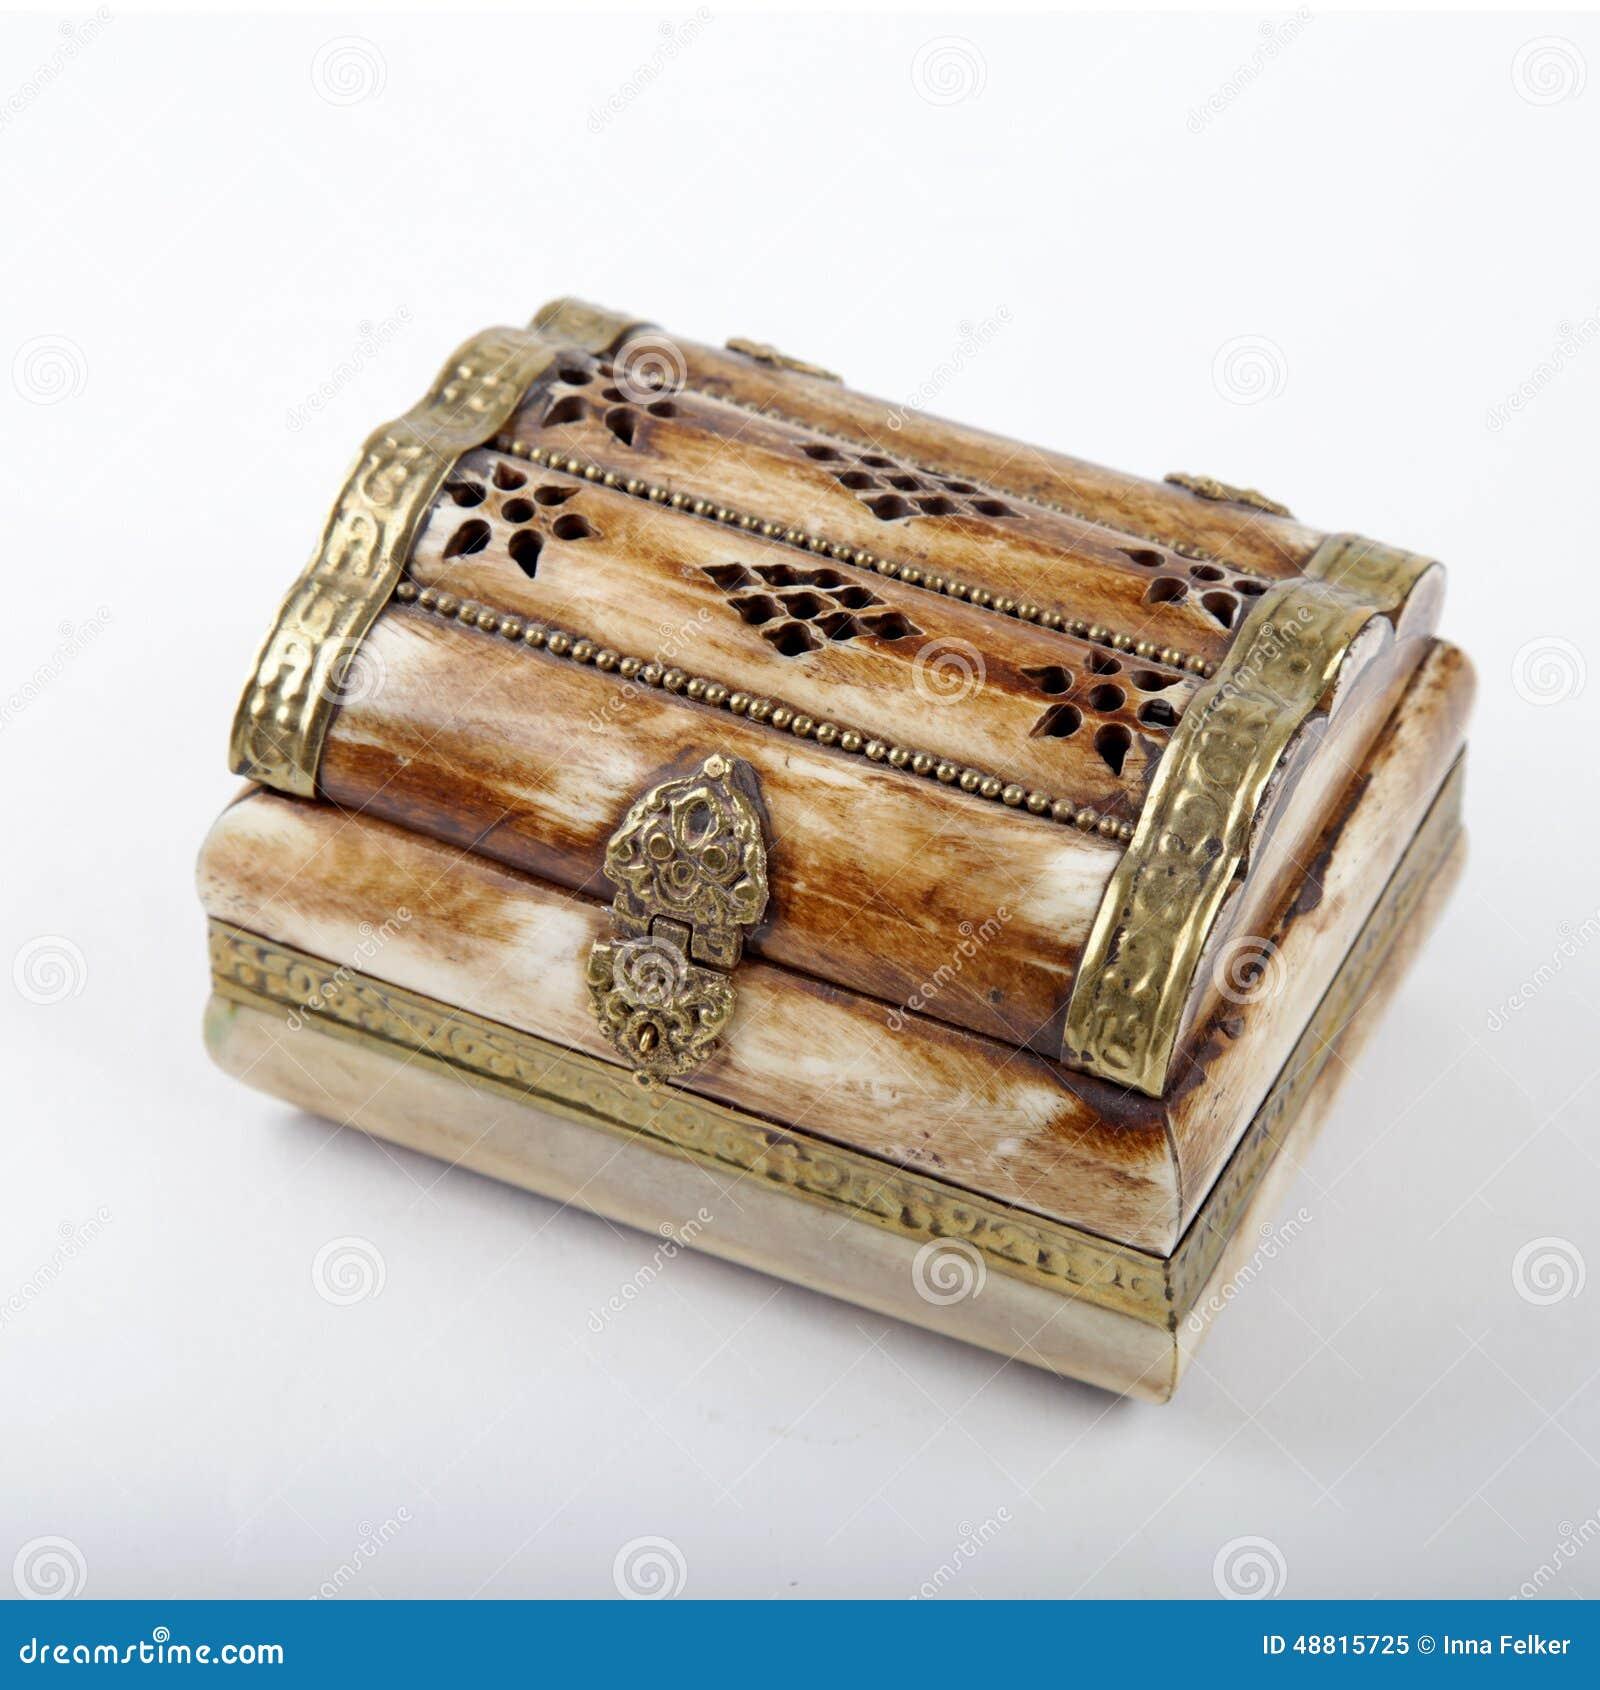 Vintage Small Ornate Treasure Box Made Of Camel Bone Stock